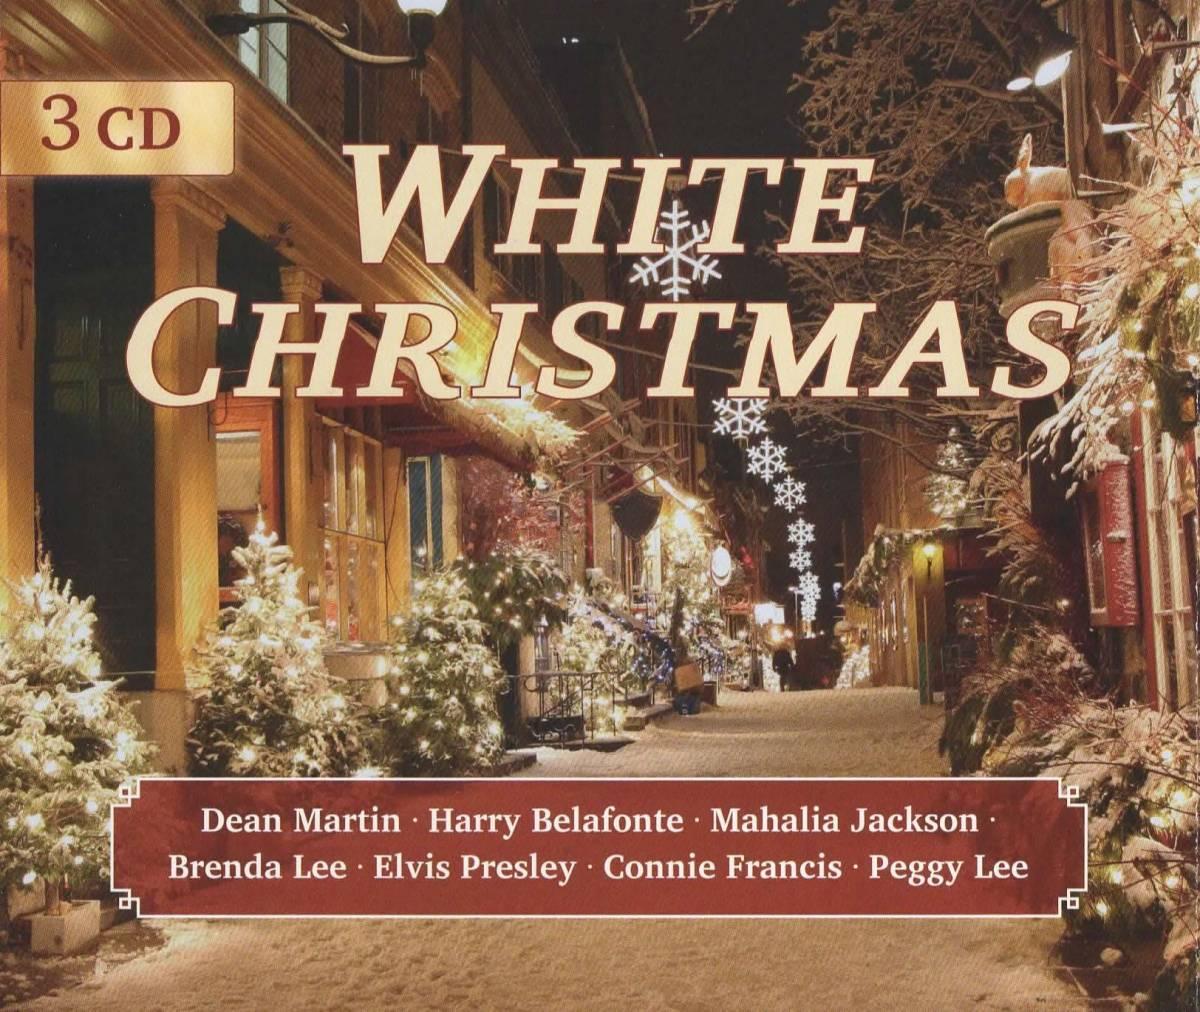 Dean Martin White Christmas.White Christmas 3 Cd 2015